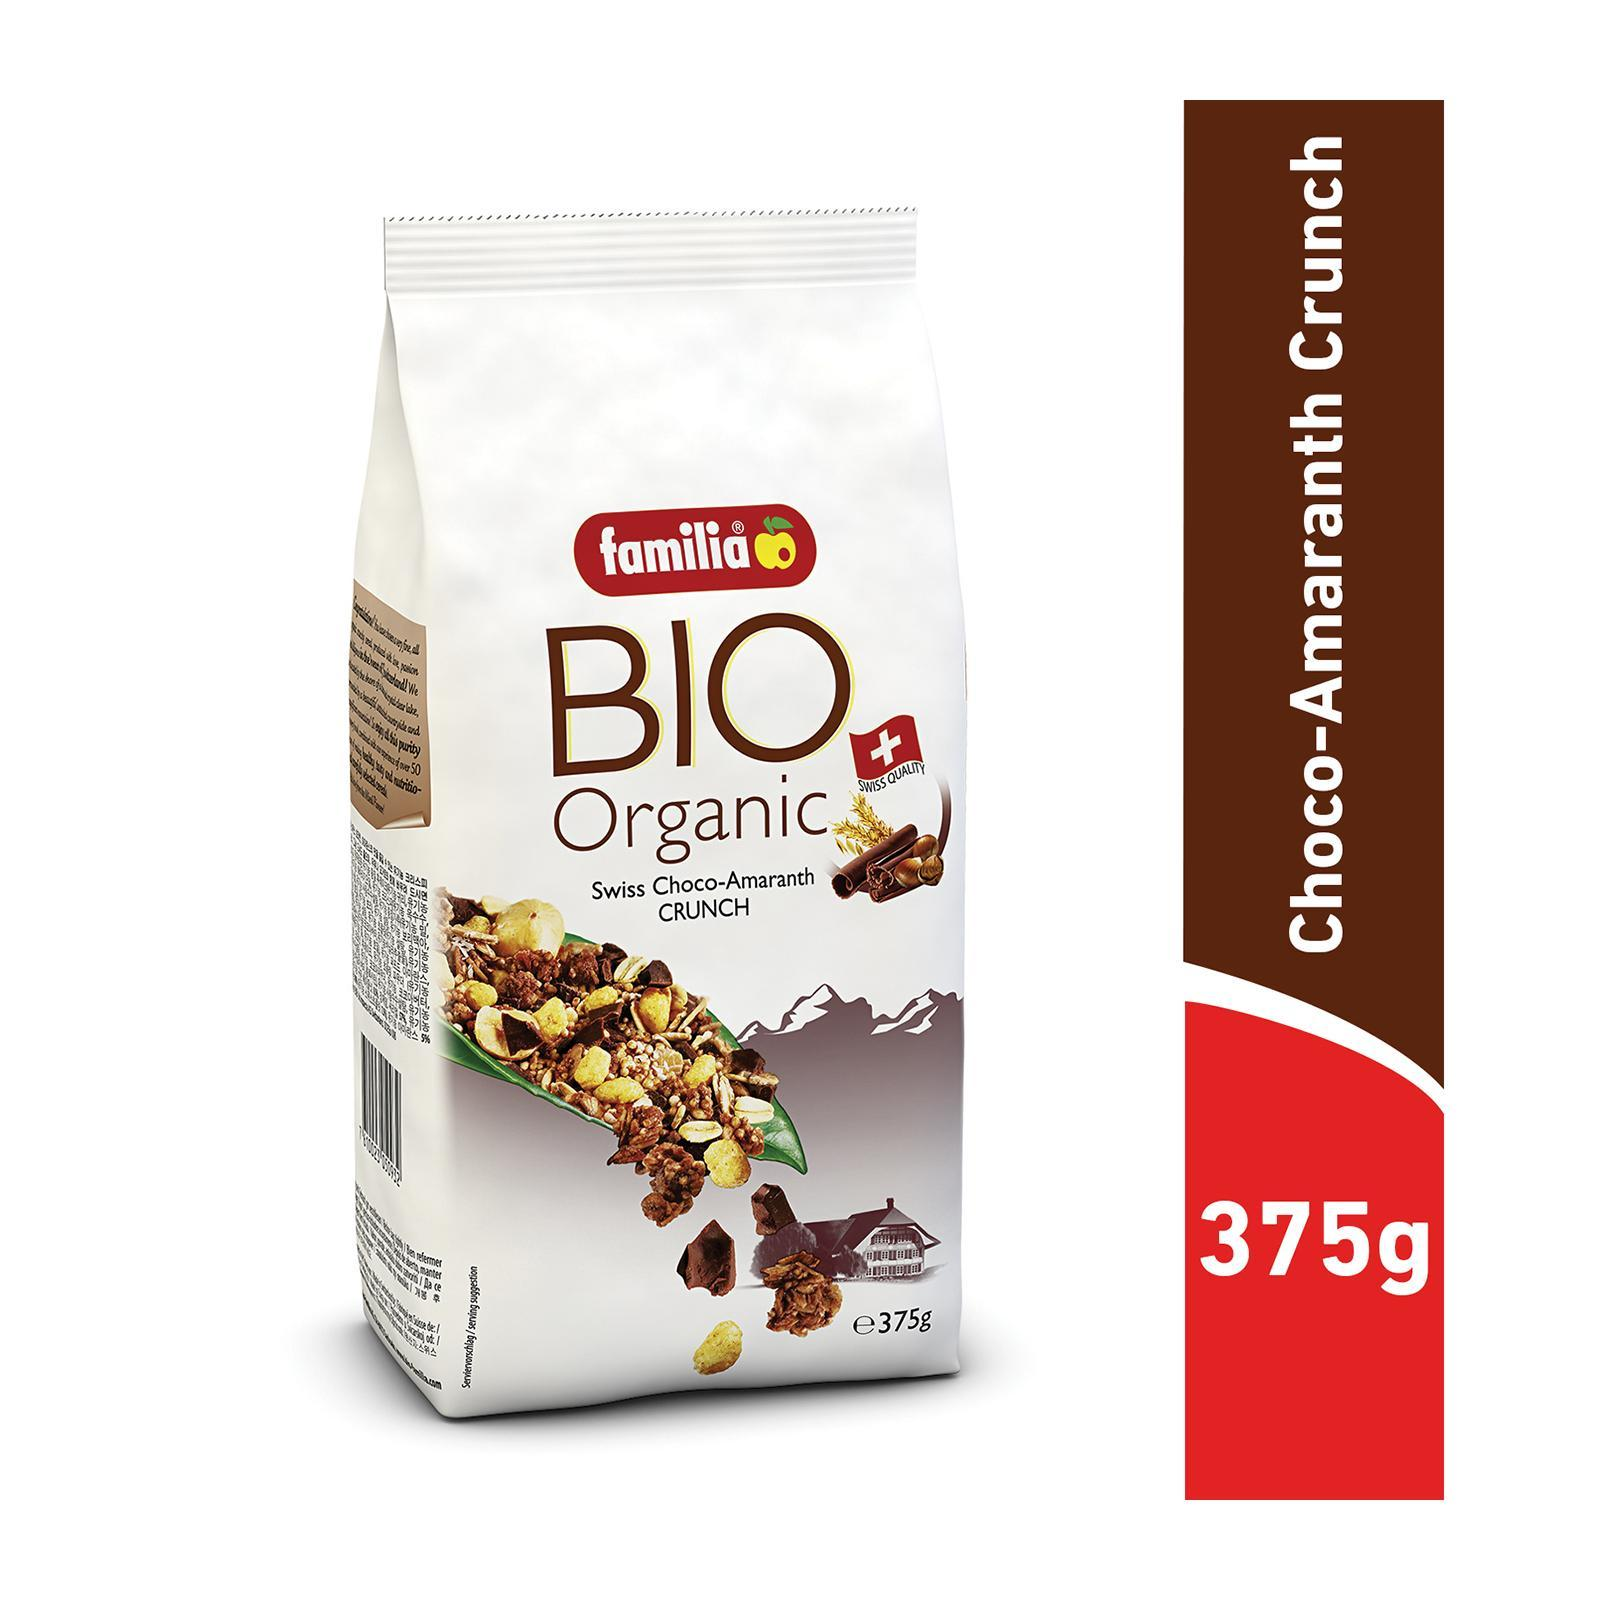 Familia Bio Organic Swiss Choco-Amaranth Crunch